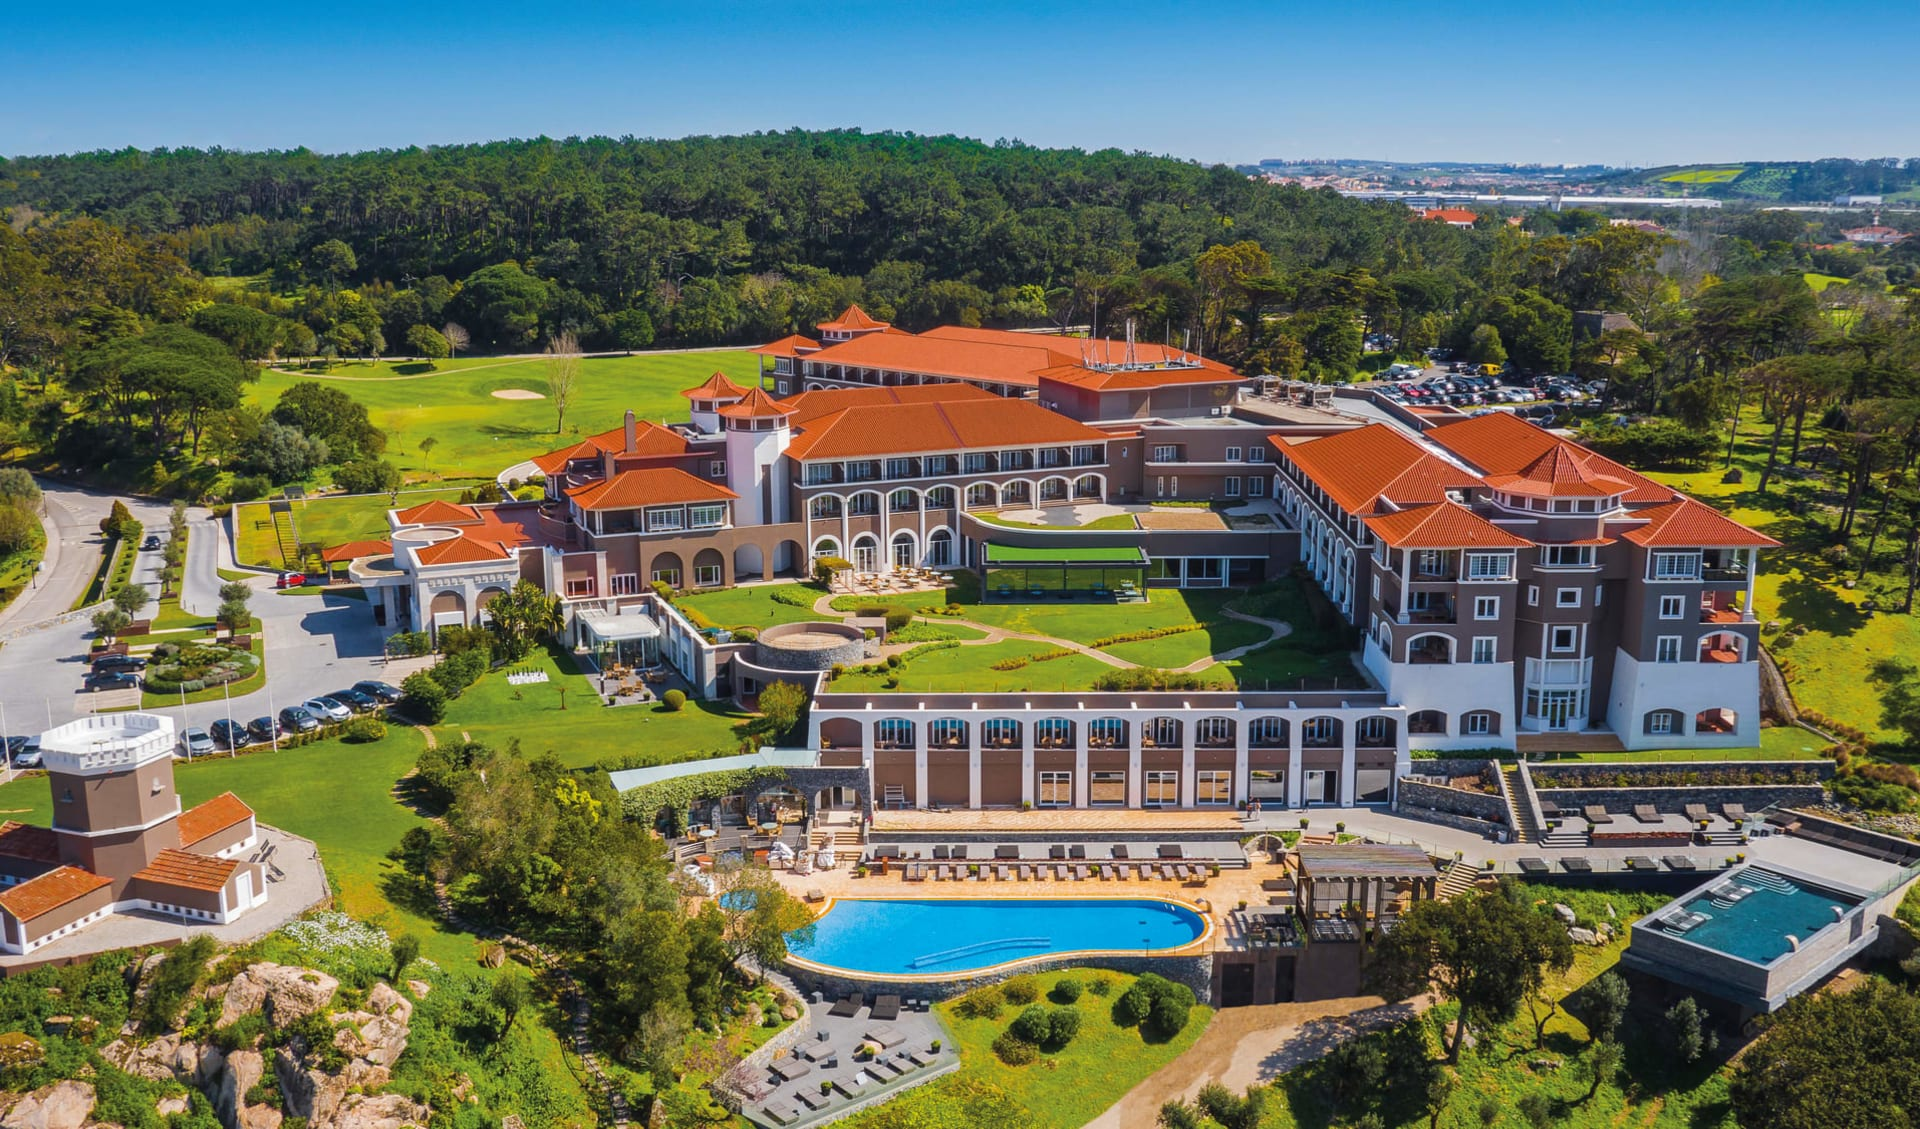 Hotel Penha Longa Resort & Spa in Lissabon: Hotel Penha Longa Resort & Spa - Blick über Anwesen